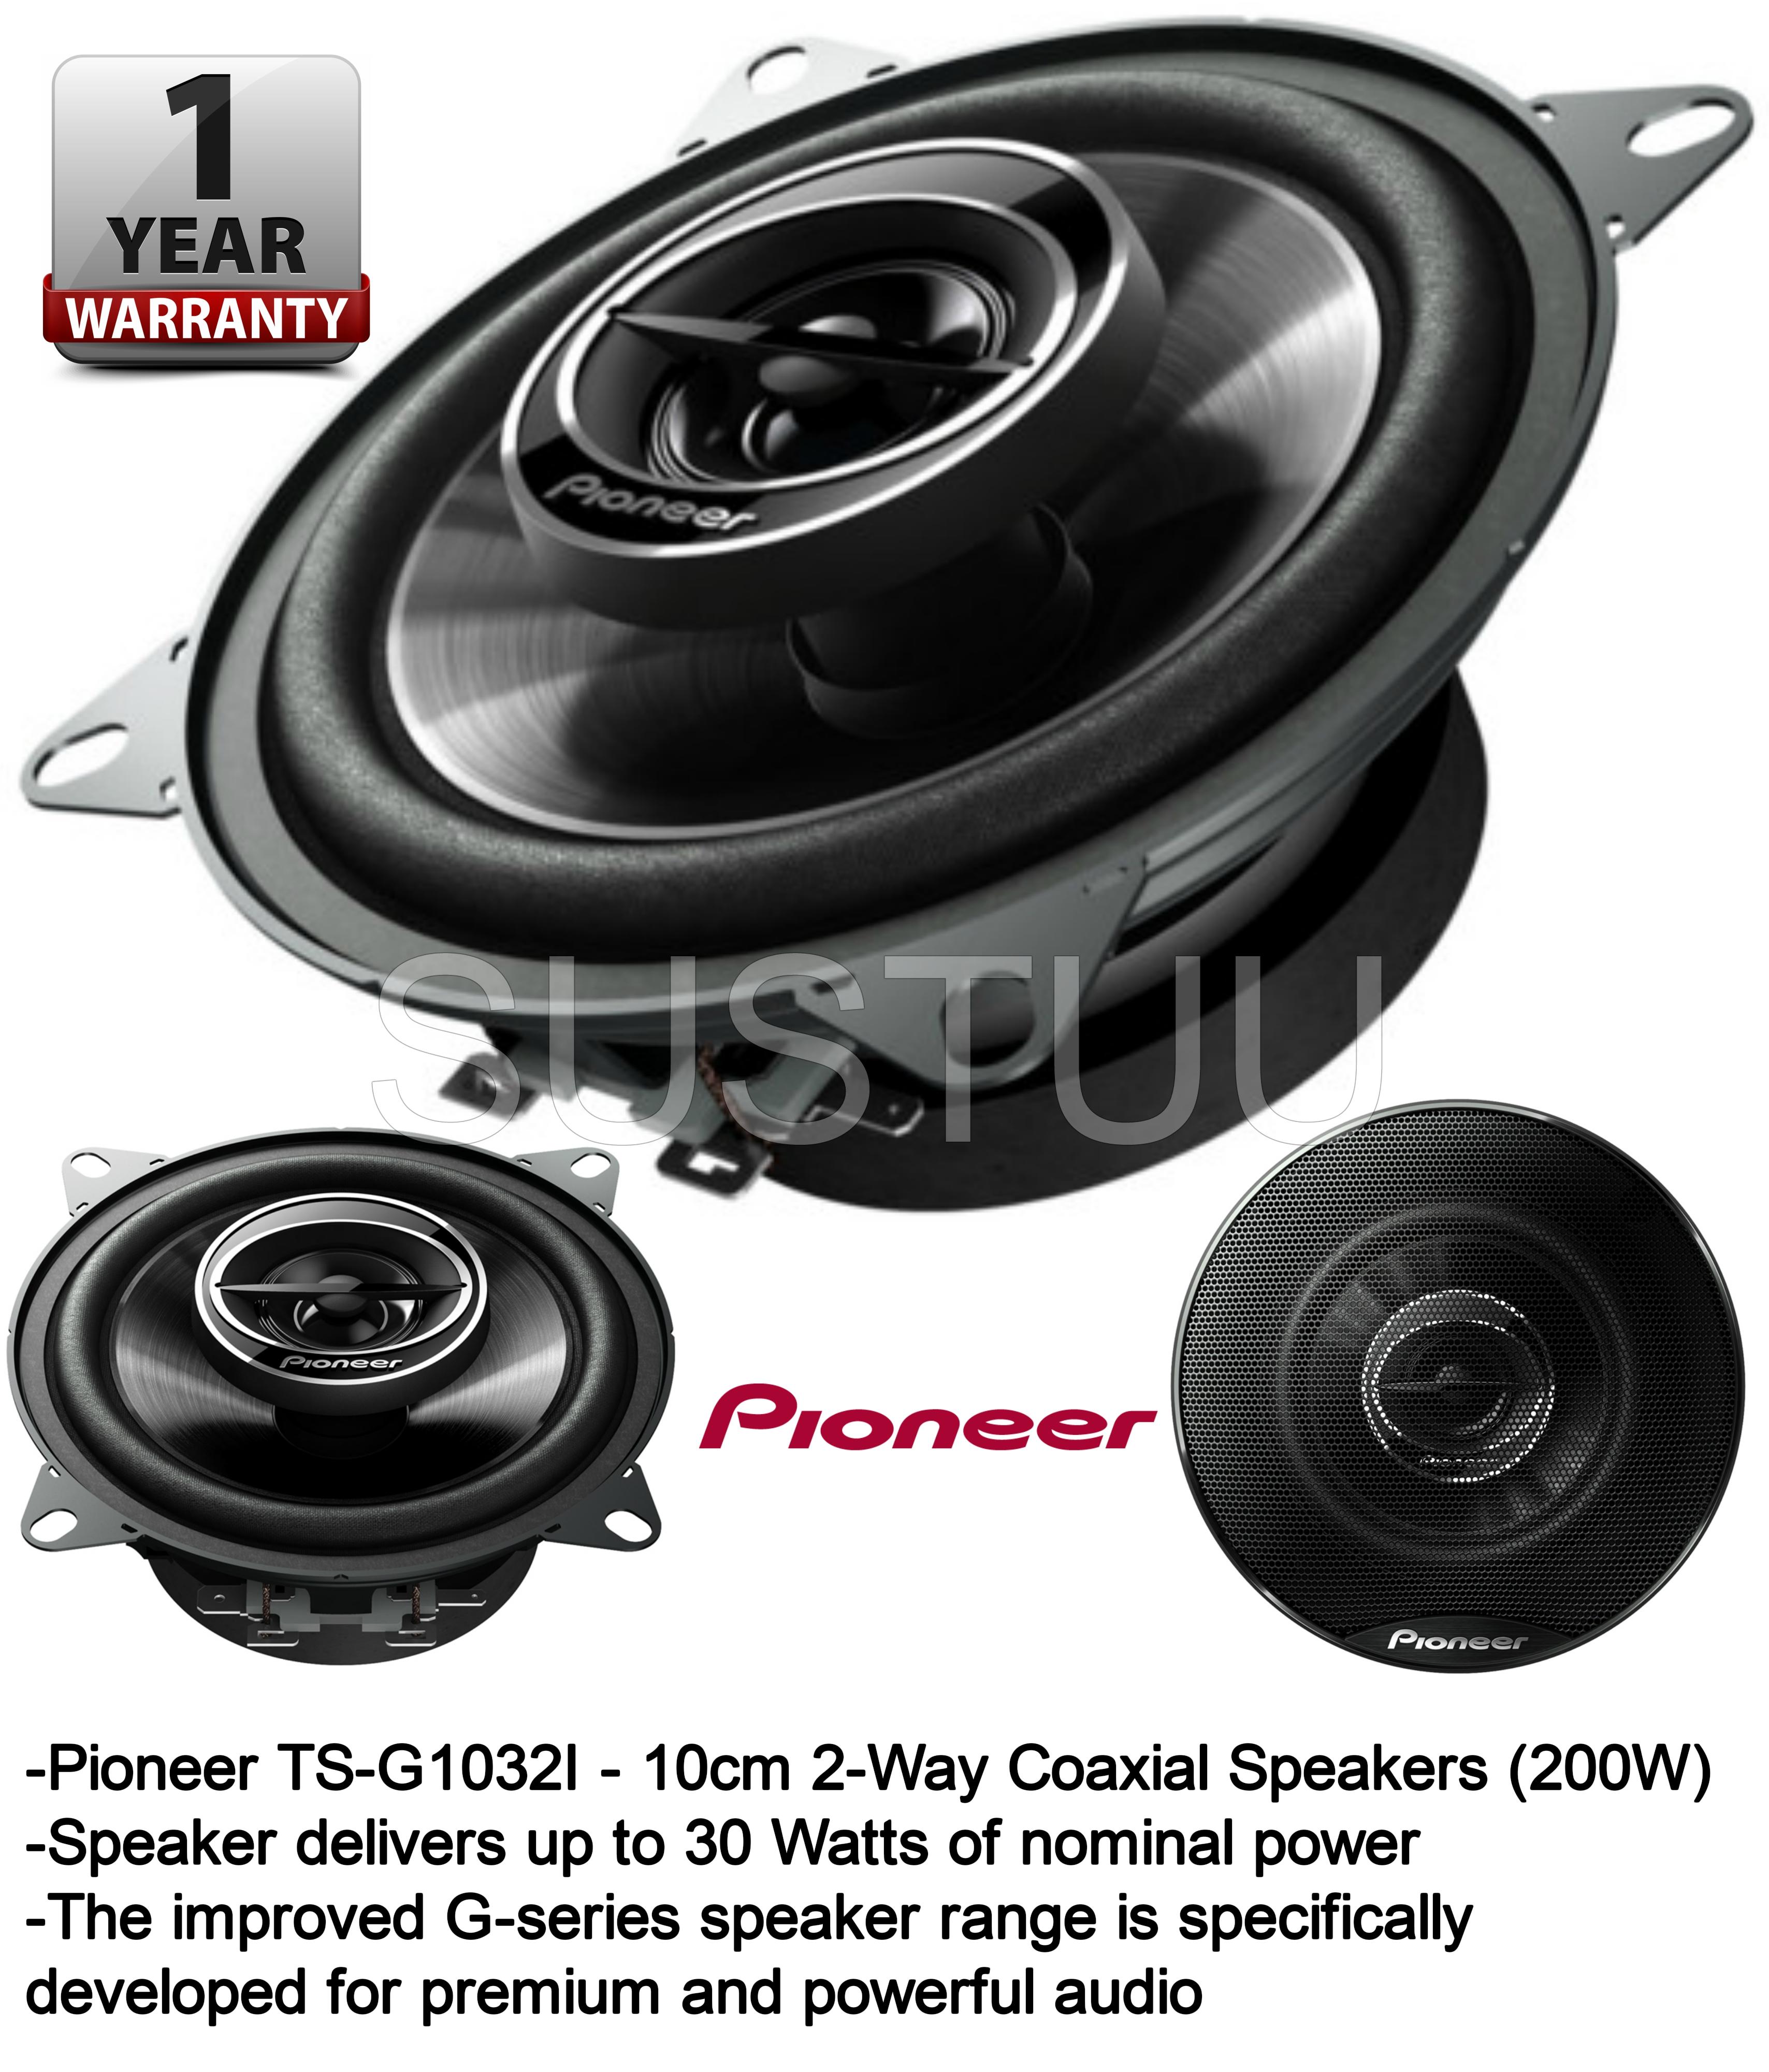 pioneer ts g1032i 4 zoll 100mm 10cm 2 weg koaxial auto. Black Bedroom Furniture Sets. Home Design Ideas